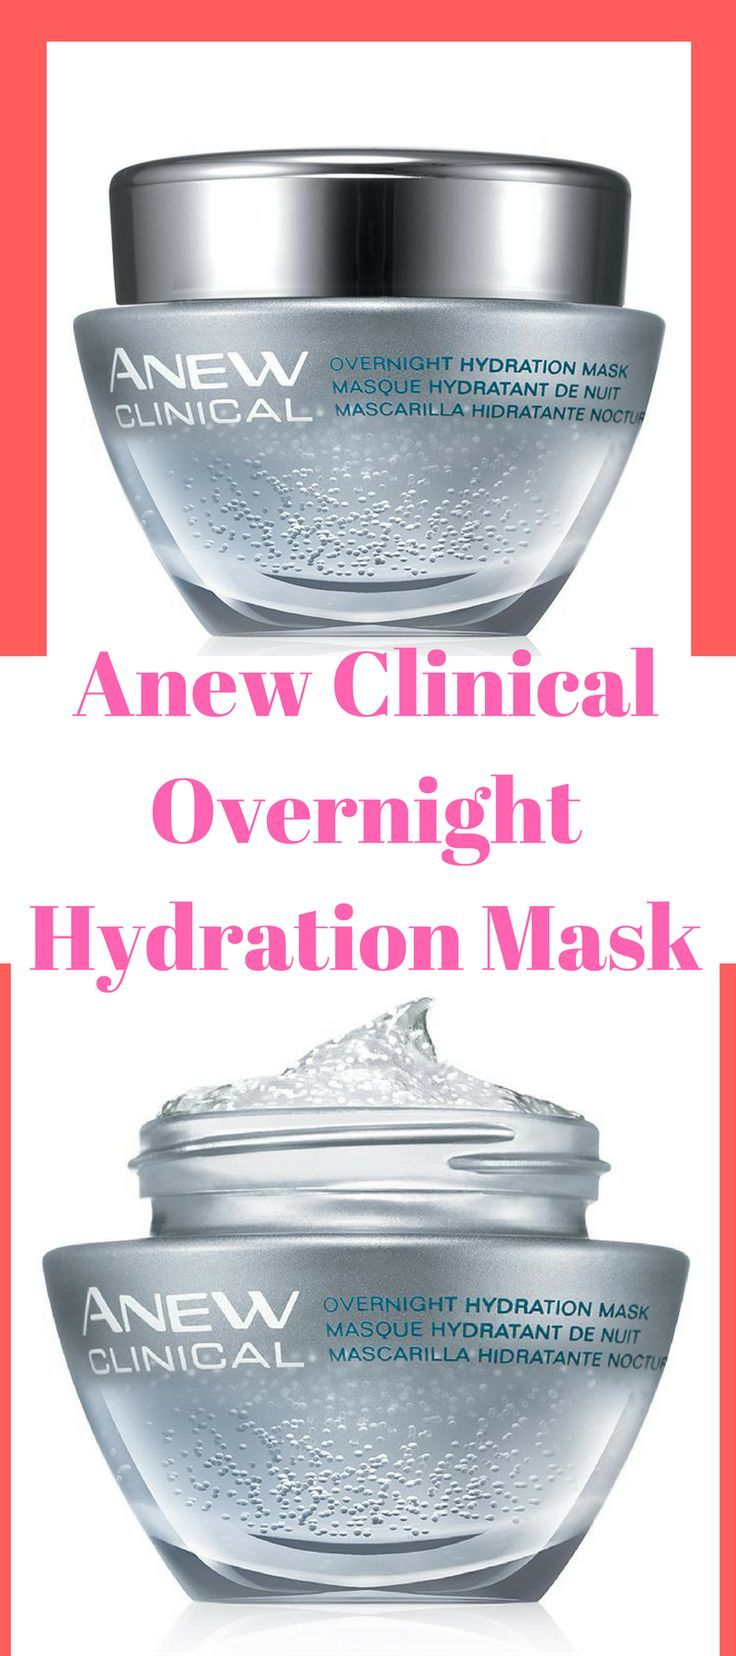 Anew Clinical Overnight Hydration Mask  #skincare #skincareproduct #skincareregimens #skincarejunkie #skincareroutine #skincareacne